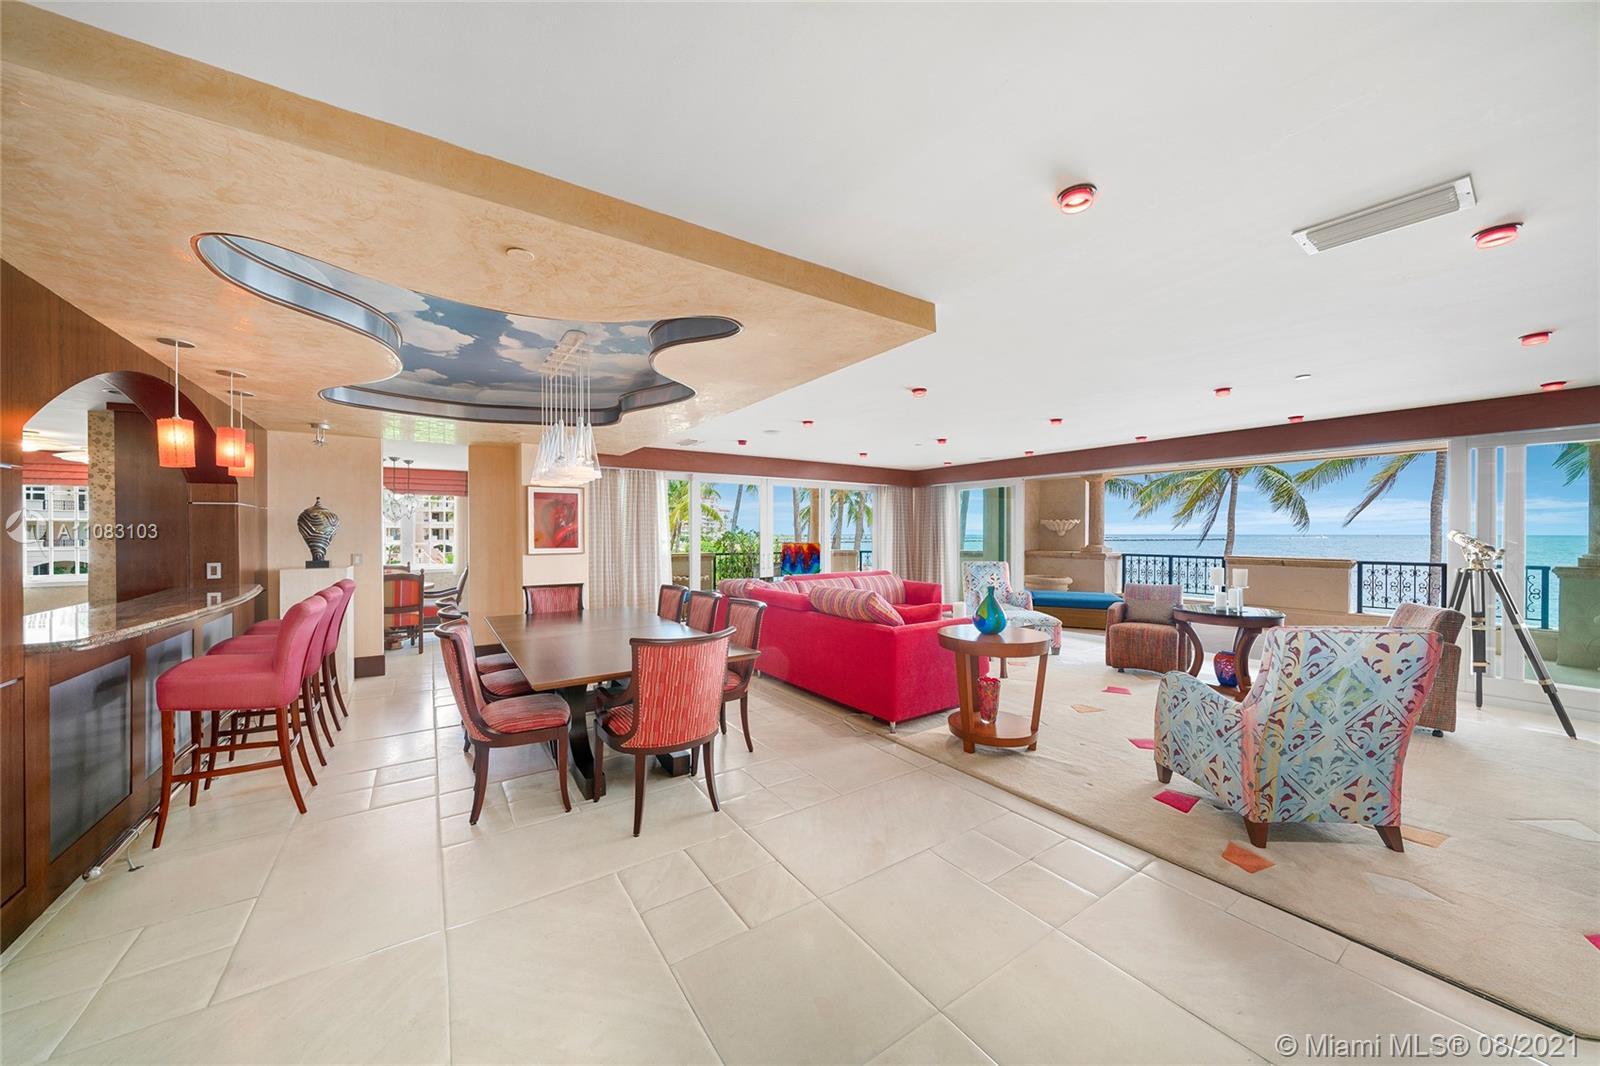 7924 Fisher island dr-7924 miami-beach-fl-33109-a11083103-Pic01